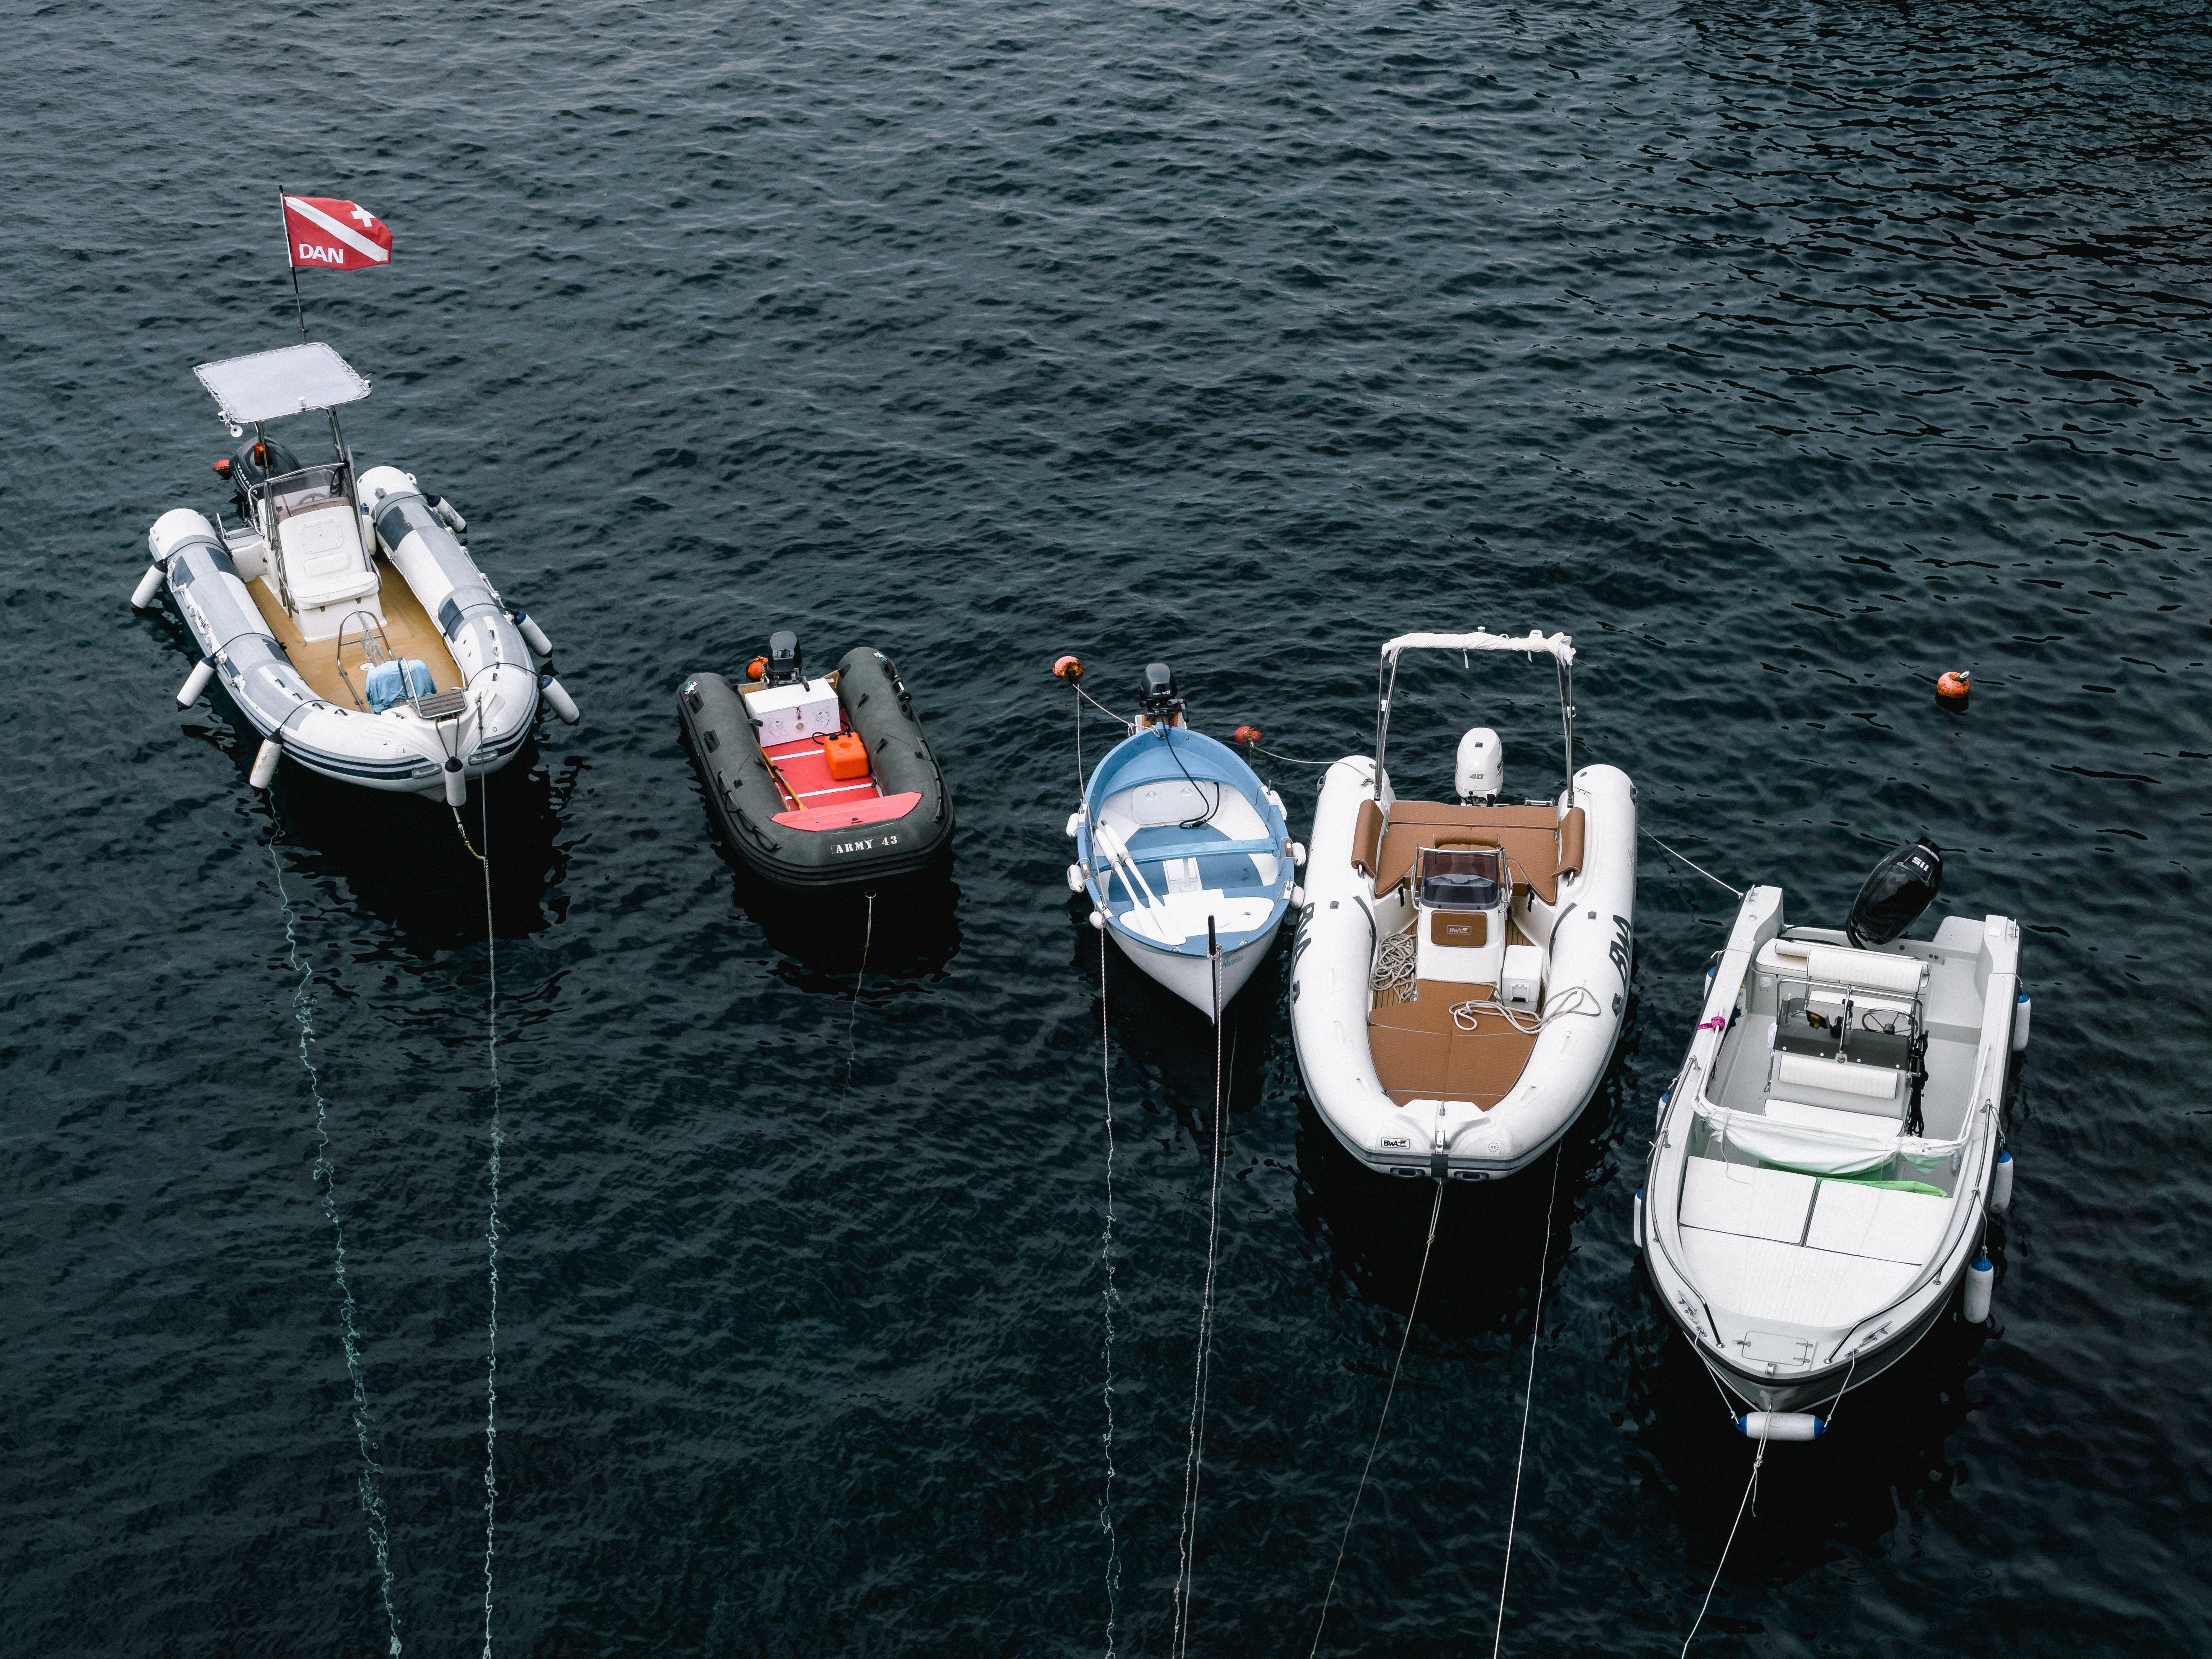 Photos gratuites de bateaux, d'en haut, embarcations, mer